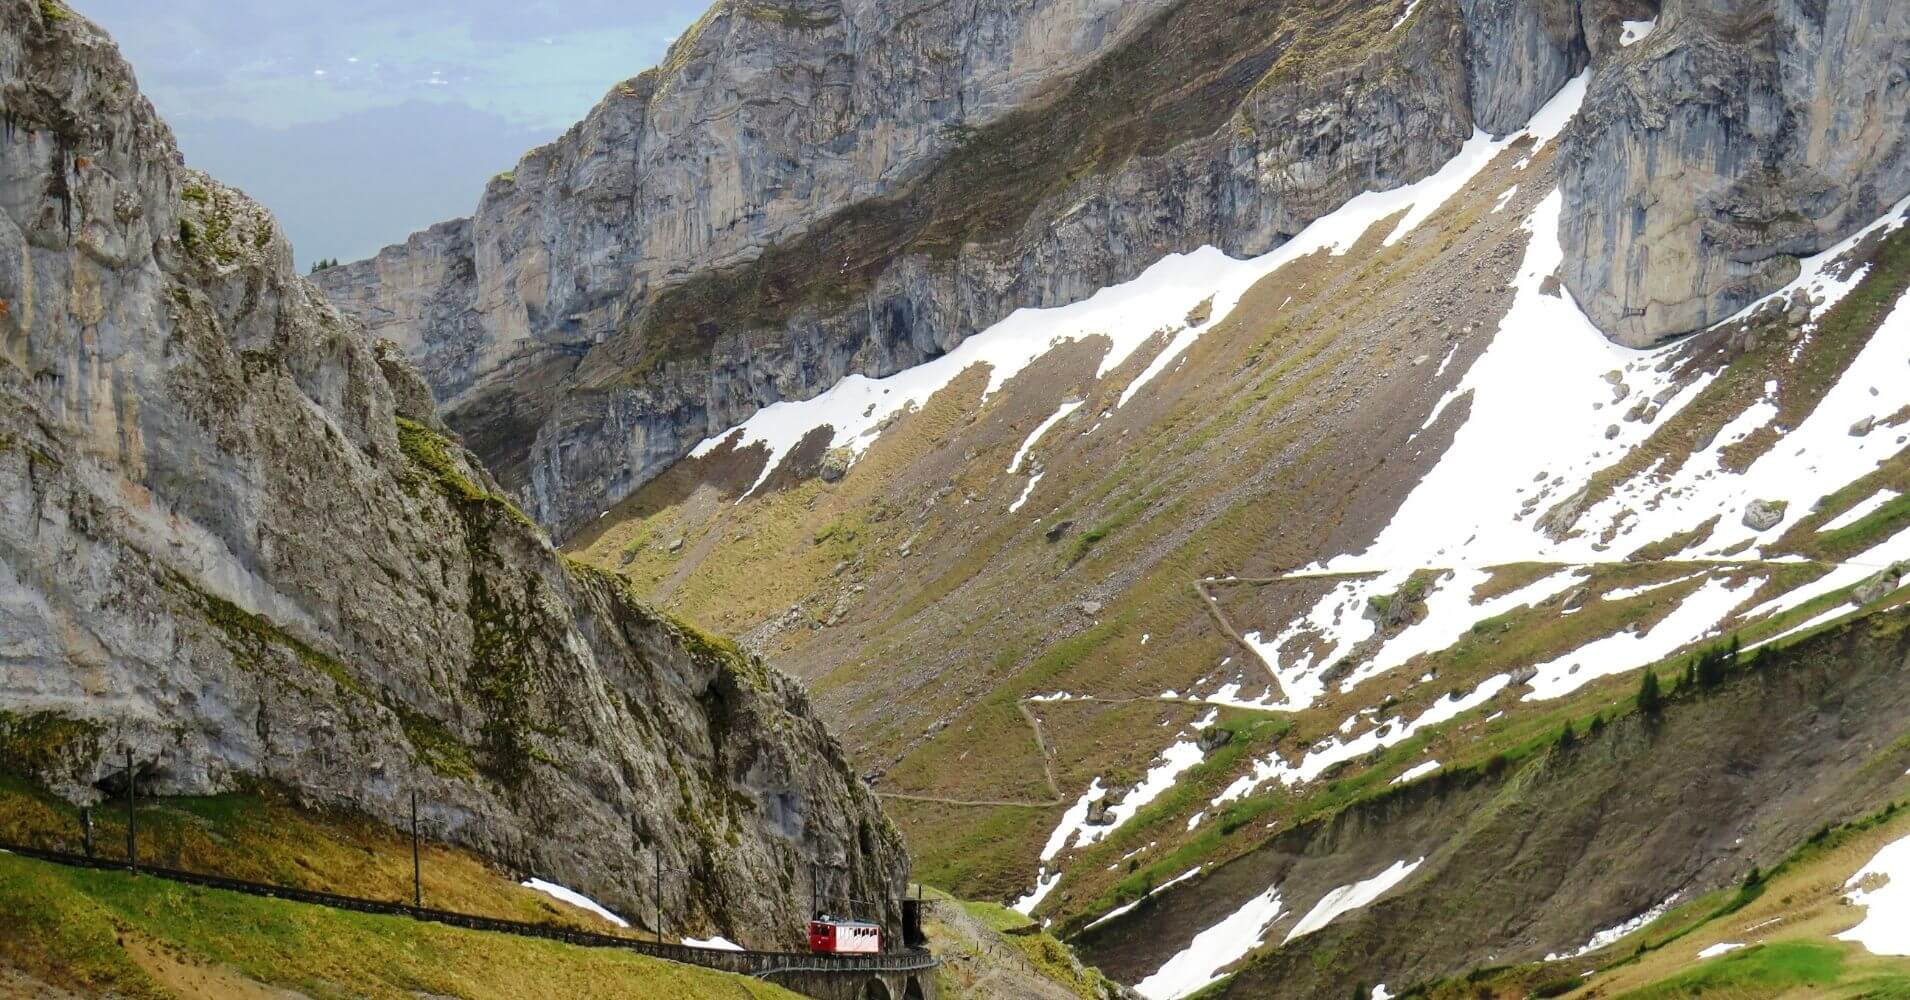 Subida del Tren de Cremallera del Monte Pilatus. Suiza.